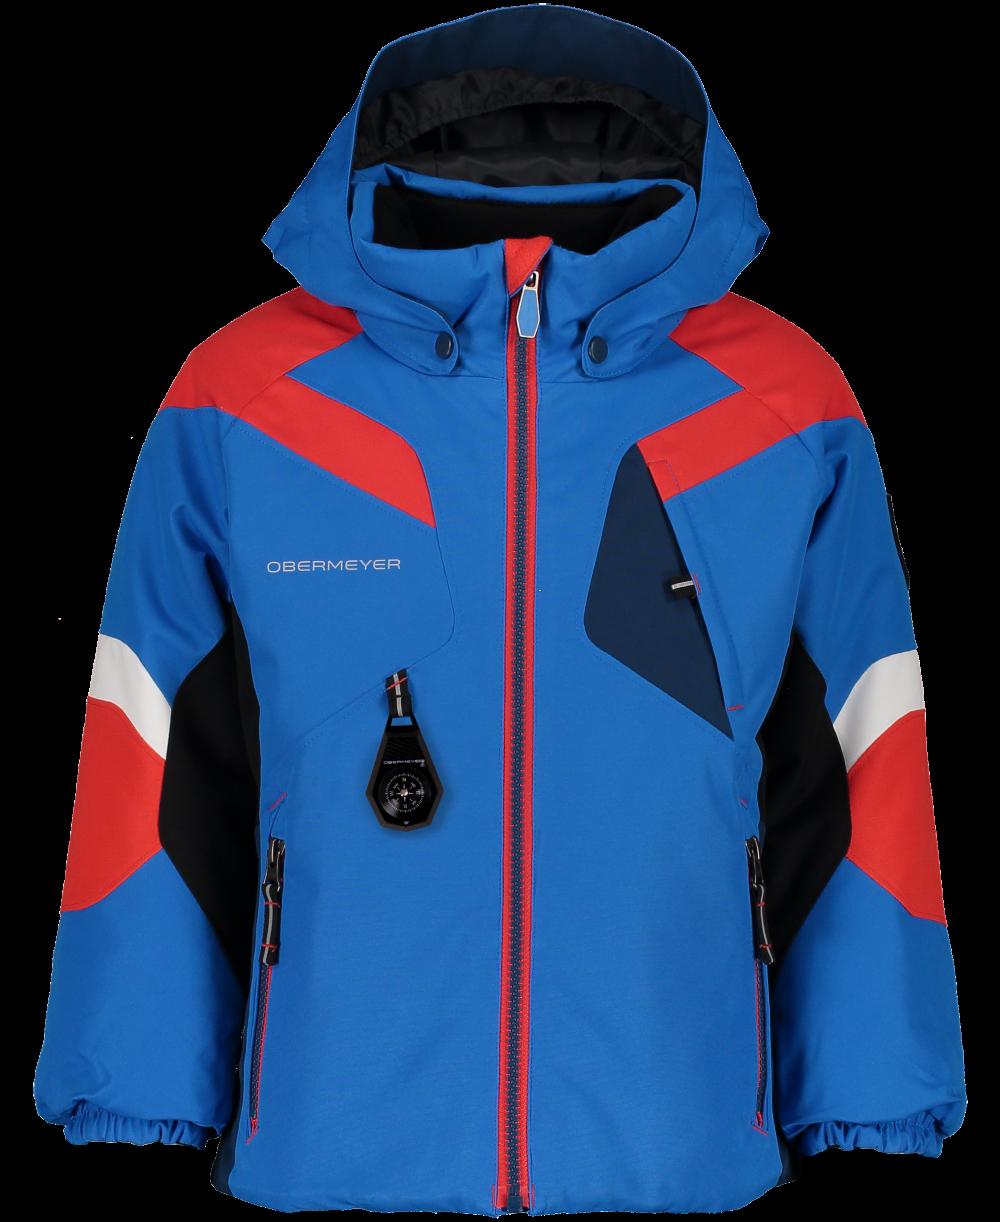 Obermeyer Boy's Jacket Altair